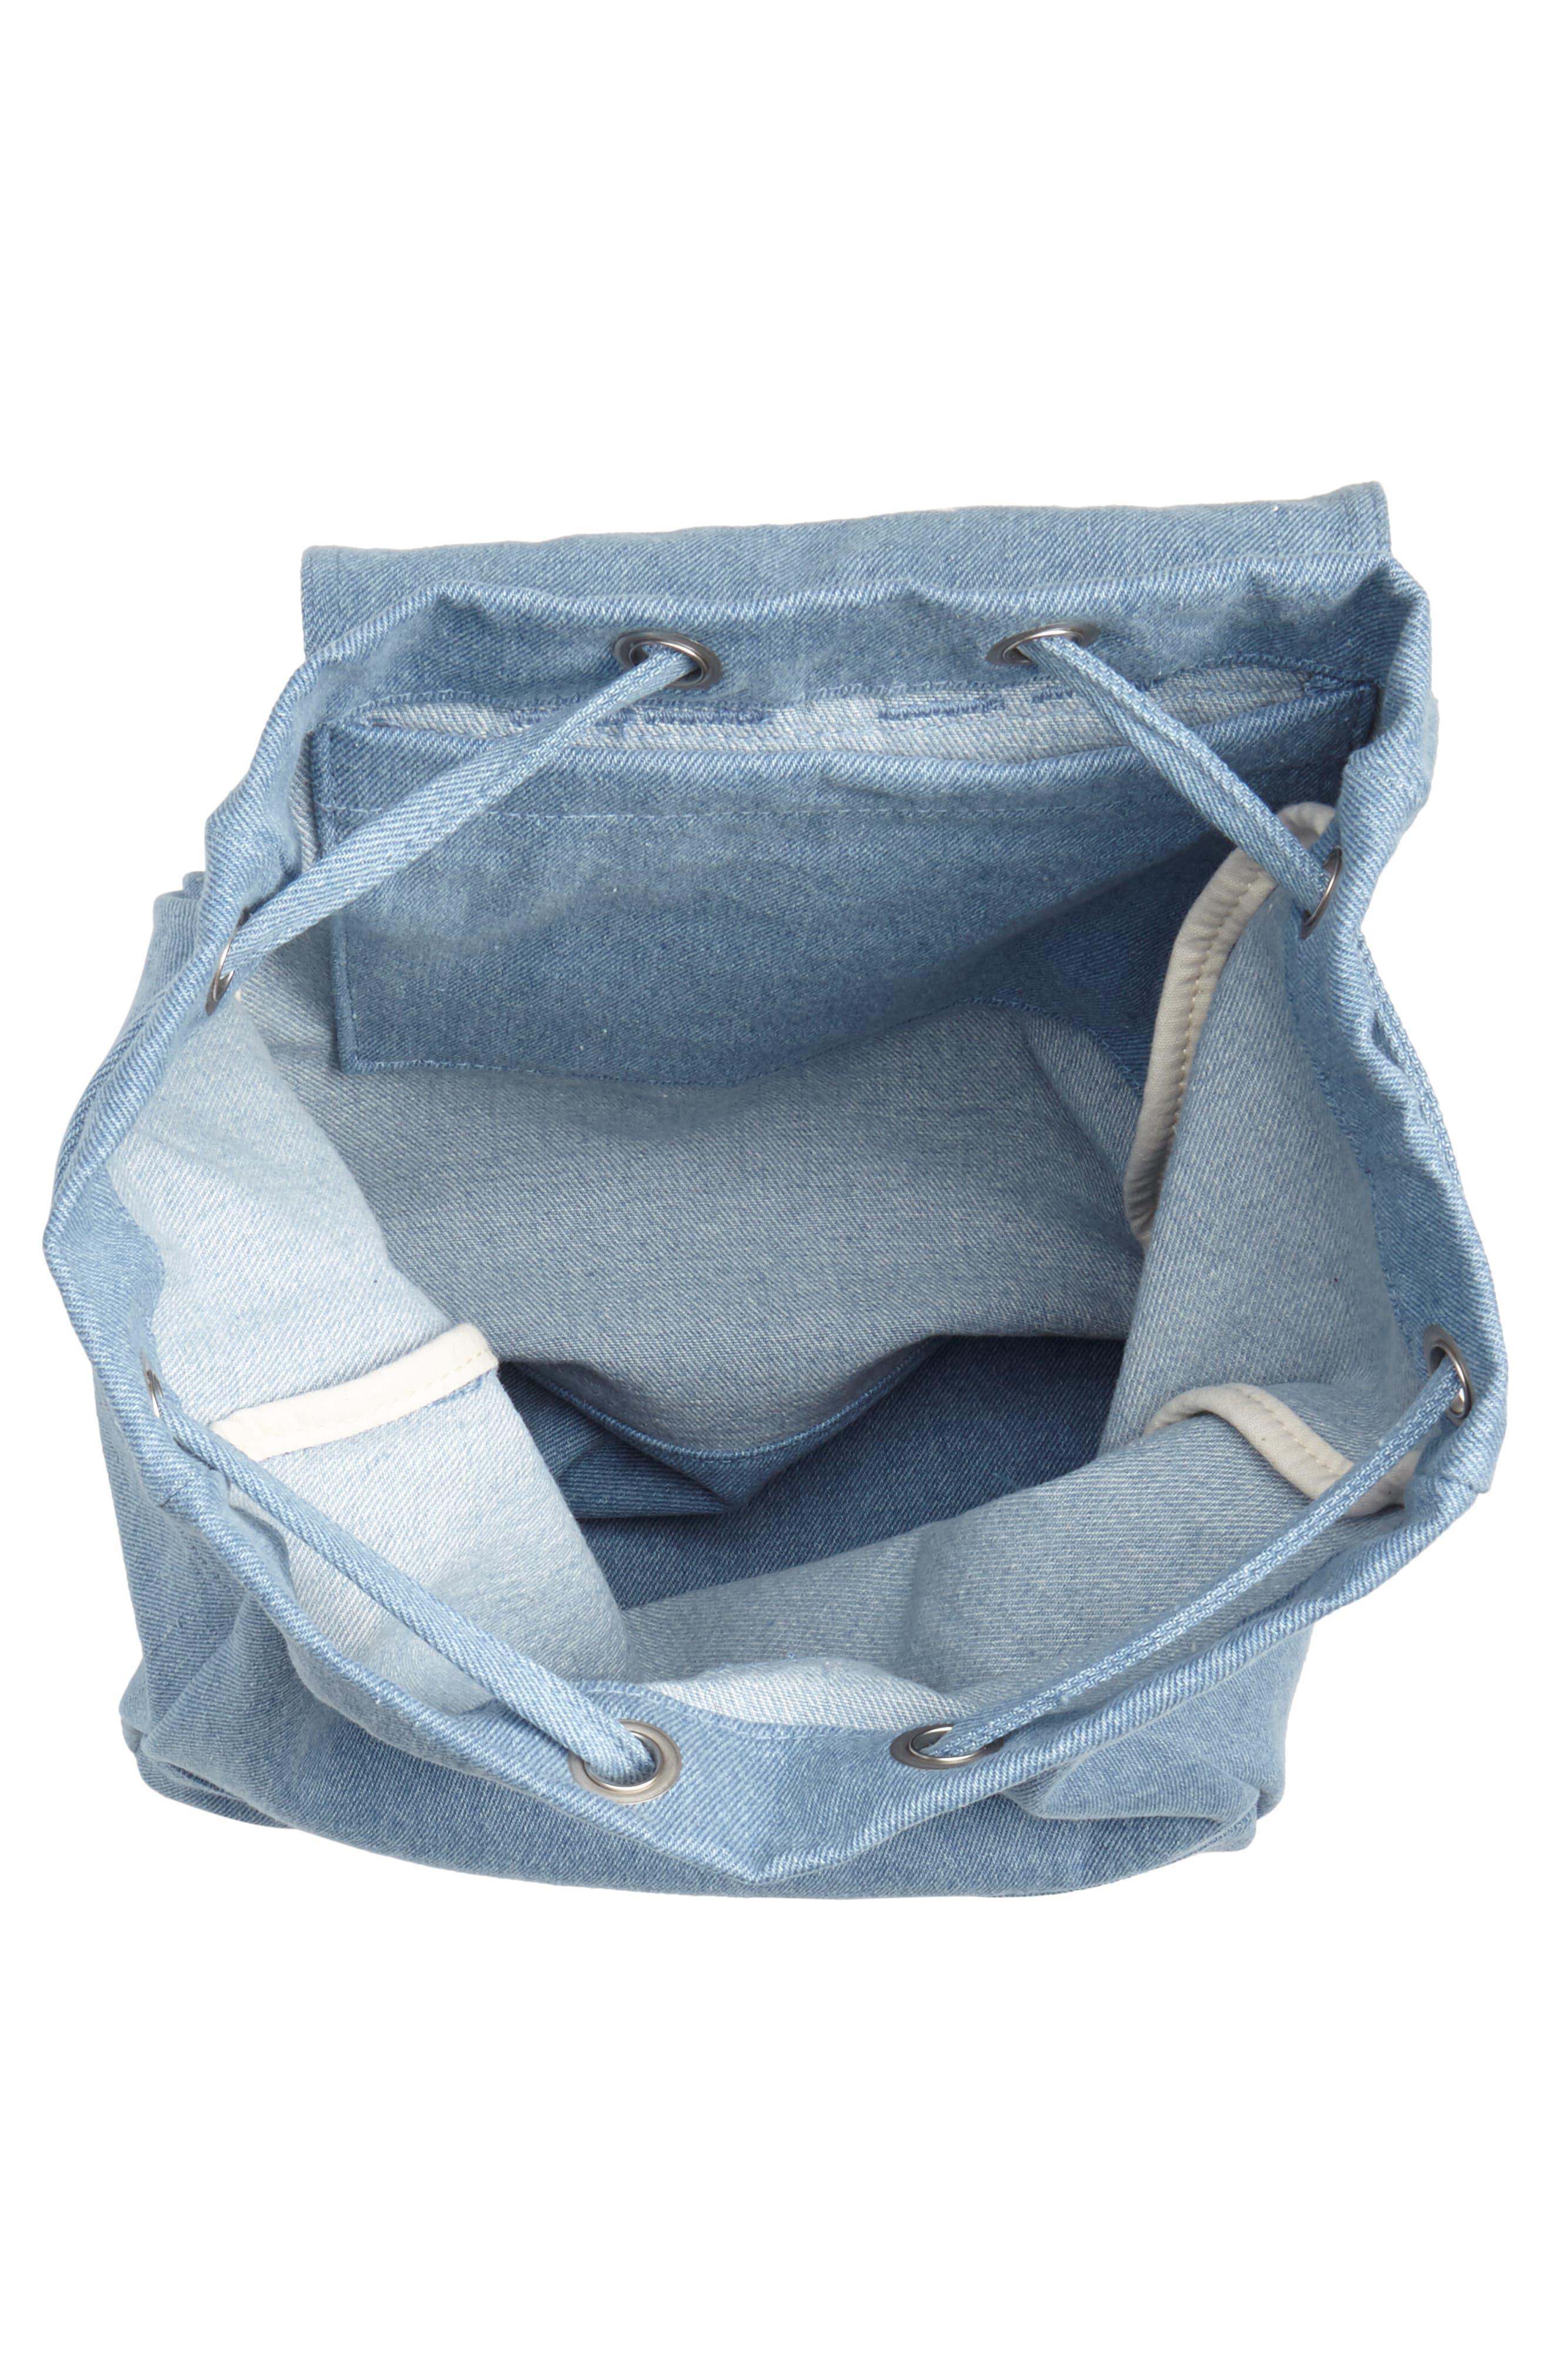 Drawstring Canvas Backpack,                             Alternate thumbnail 4, color,                             Washed Denim